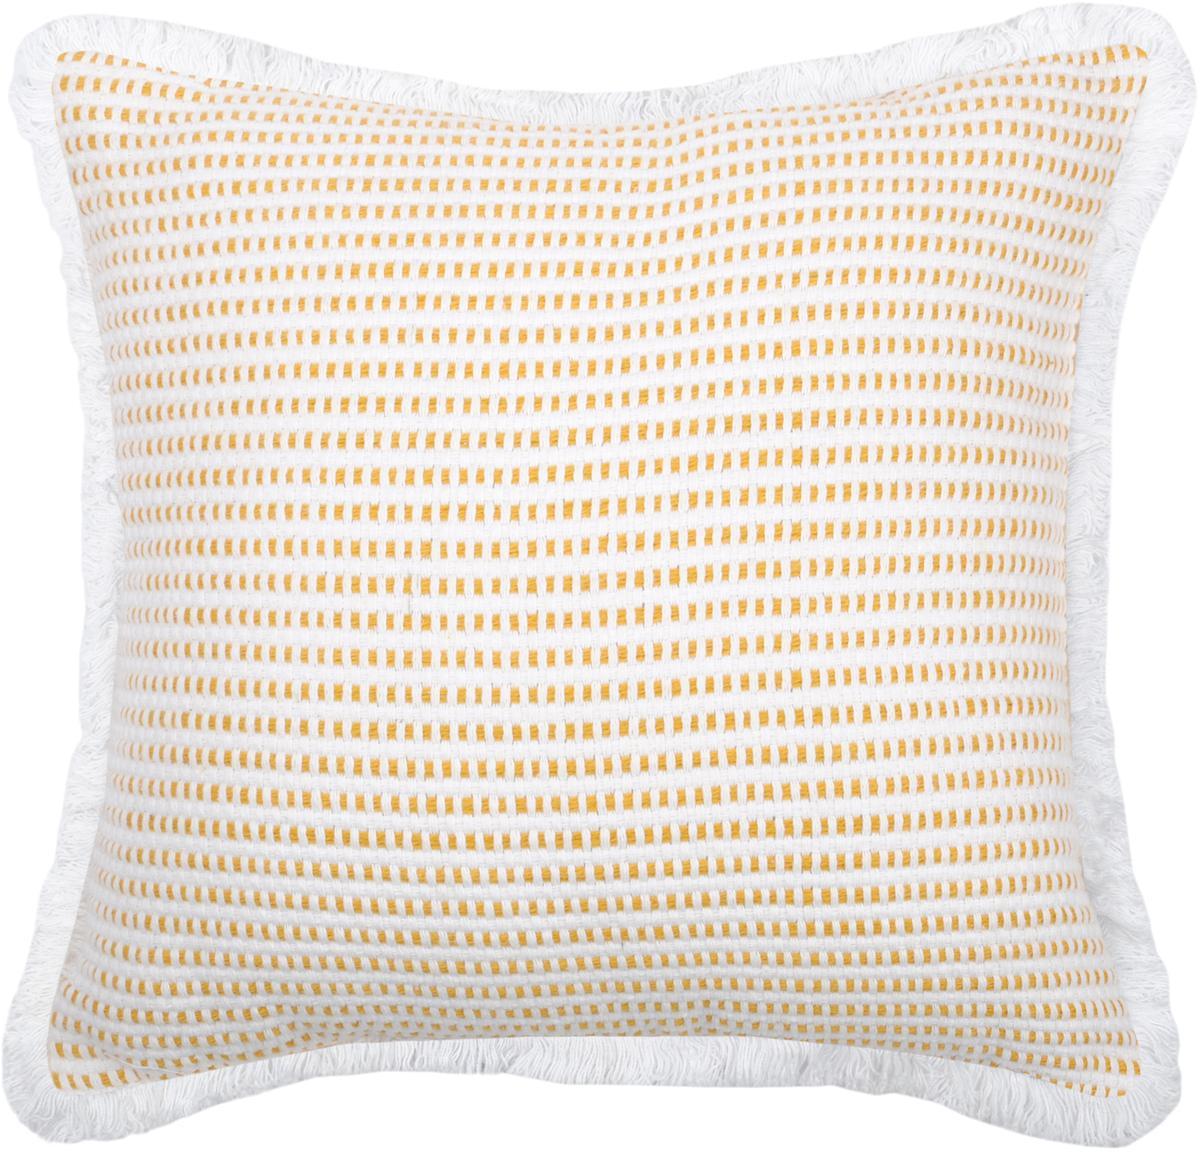 Cuscino con imbottitura giallo/bianco Salamanca, Cotone, Bianco, giallo, Larg. 40 x Lung. 40 cm